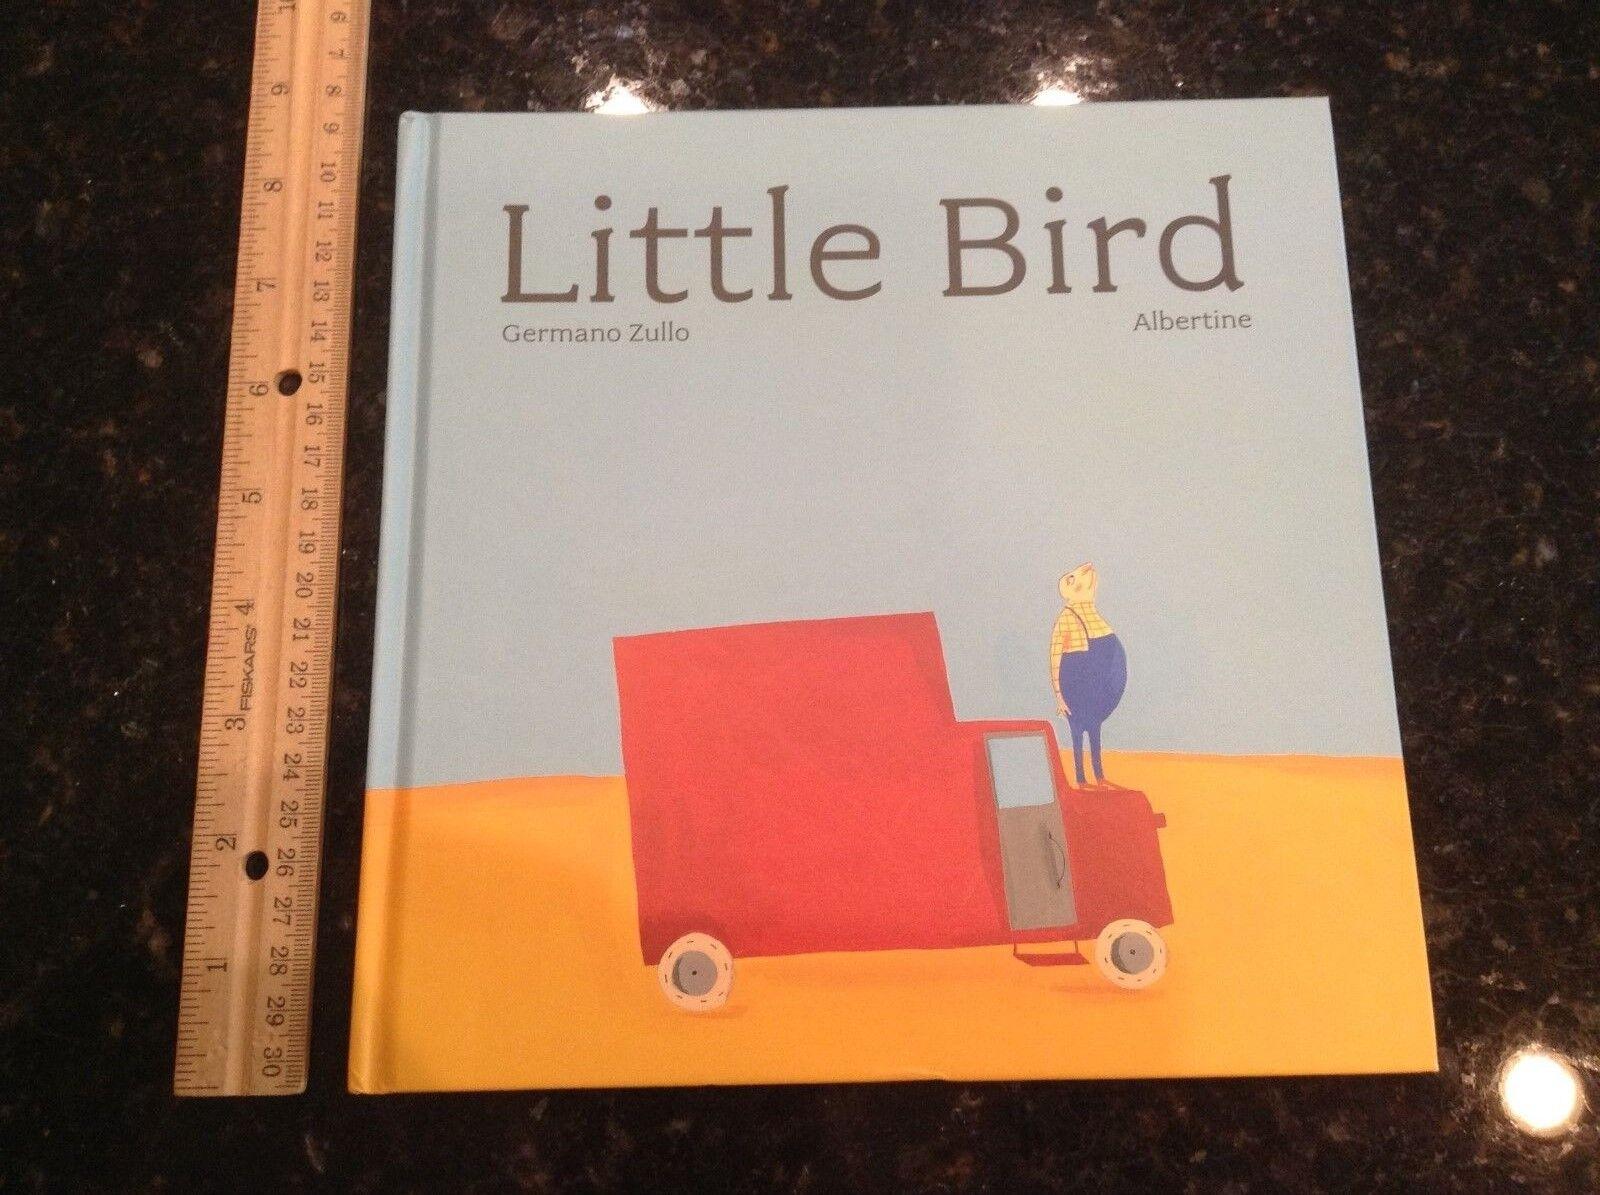 Little Bird by Albertine Germano Zullo Hardcover Book